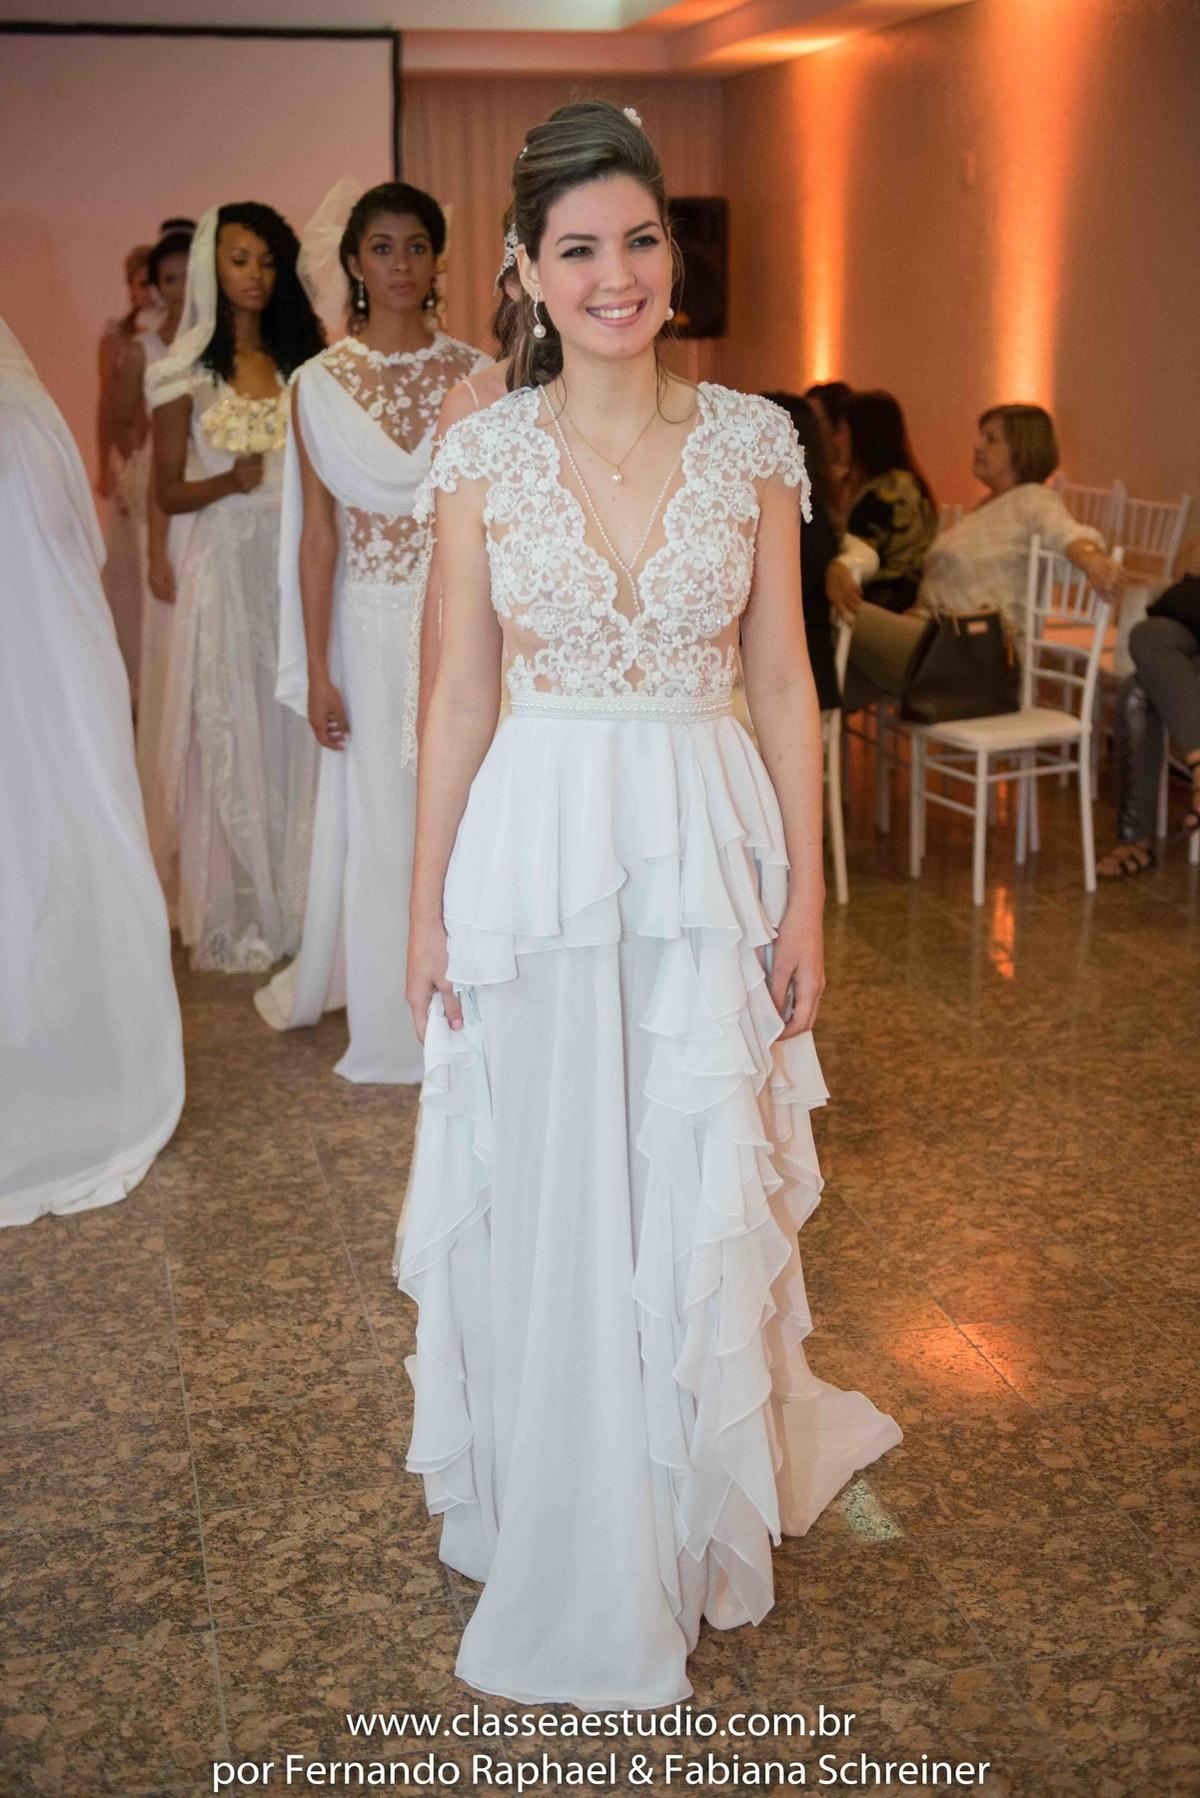 desfile de vestidos de noivas no evento wedding day do estilista Jan Souza